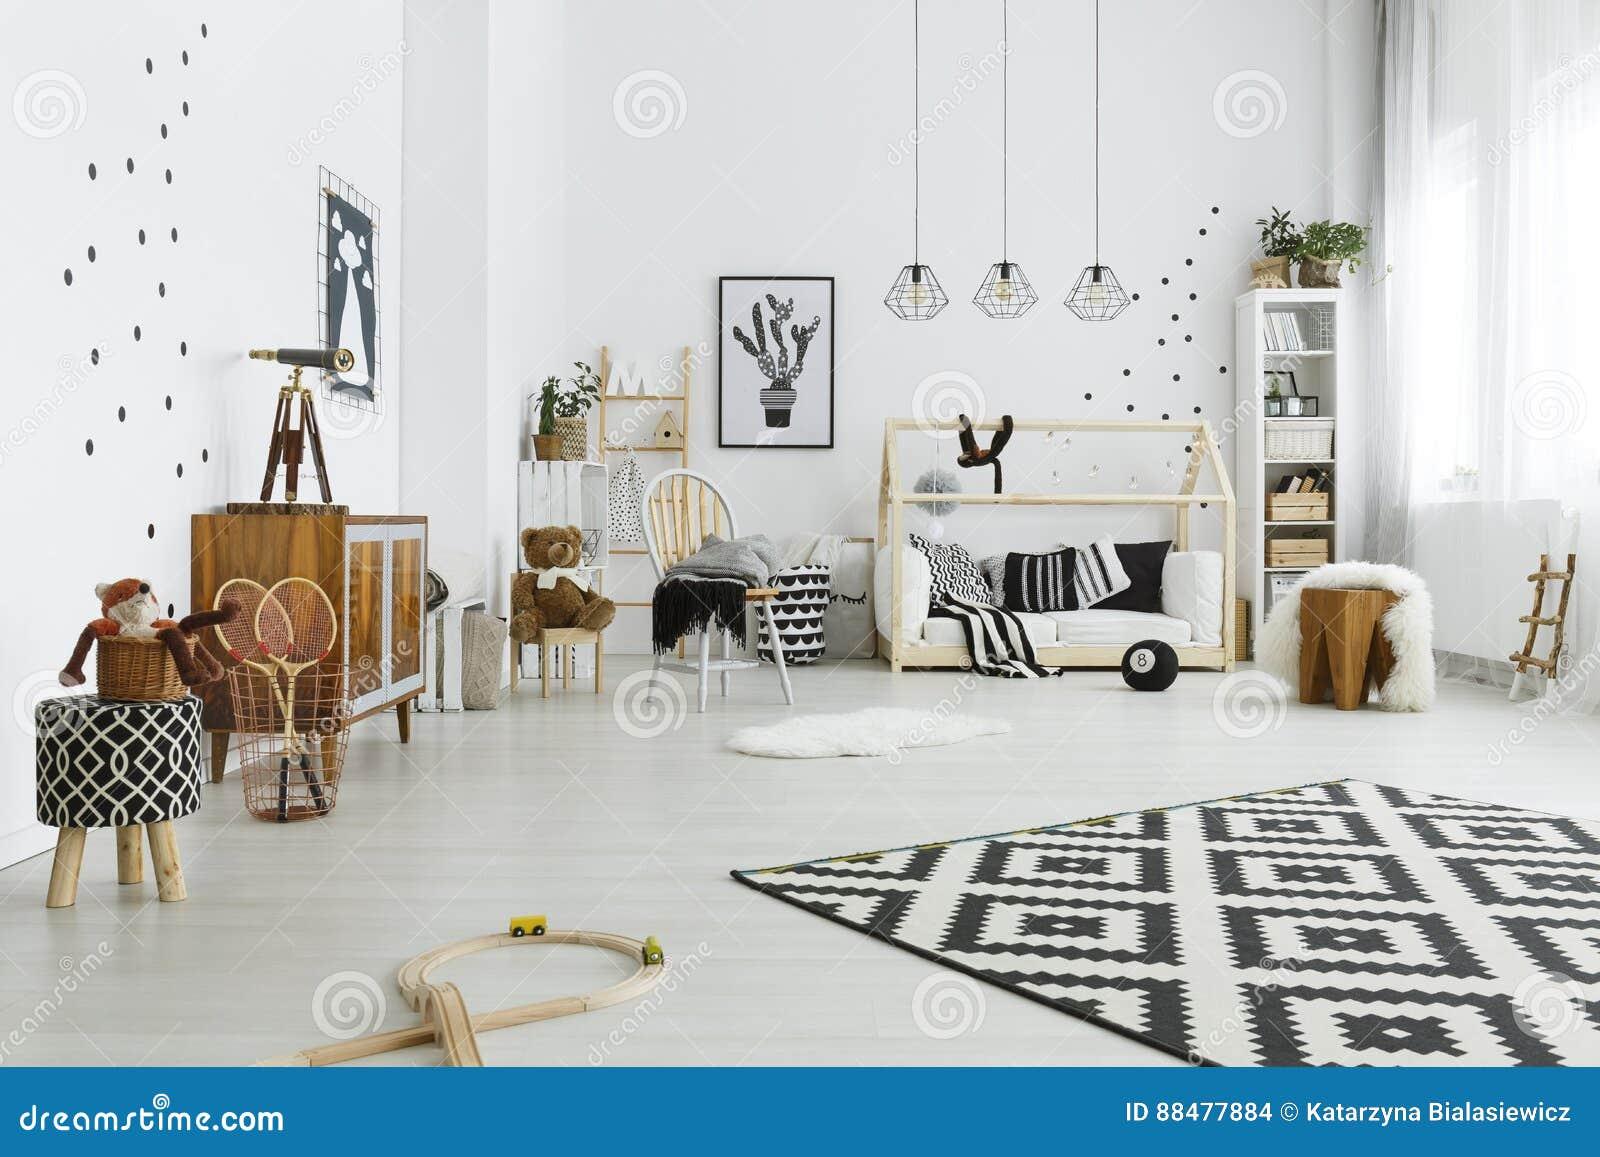 chambre d 39 enfant dans le style scandinave photo stock image du gar on d cor 88477884. Black Bedroom Furniture Sets. Home Design Ideas